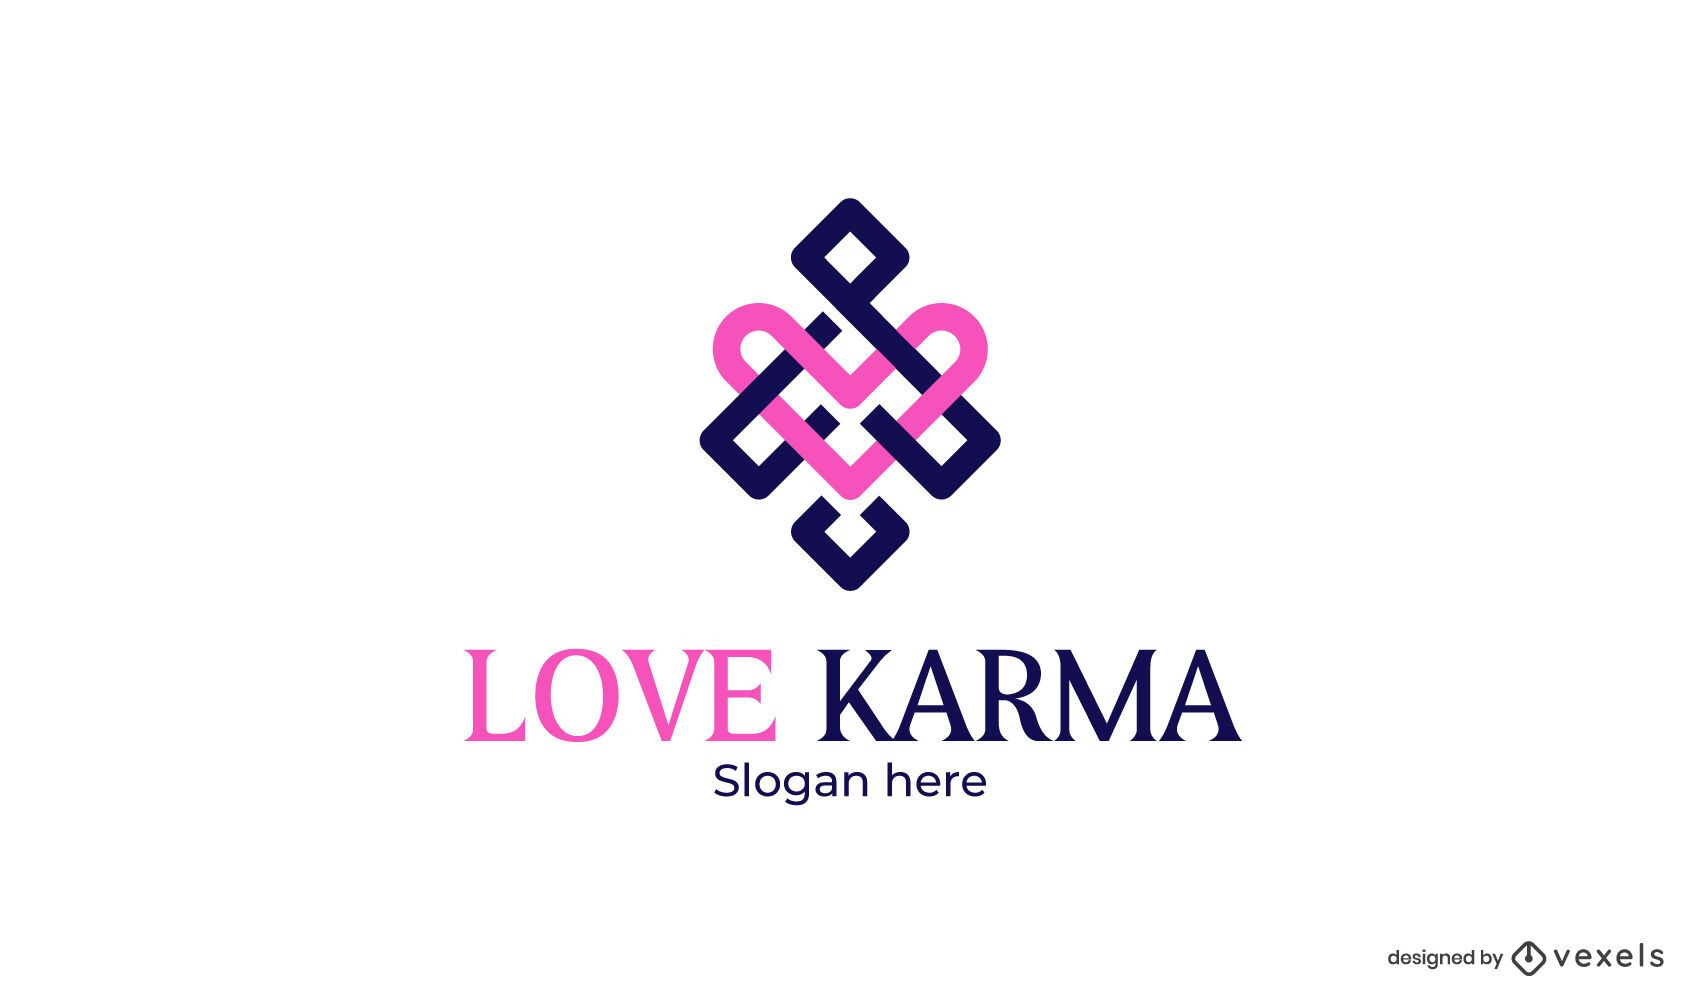 Love karma logo template design